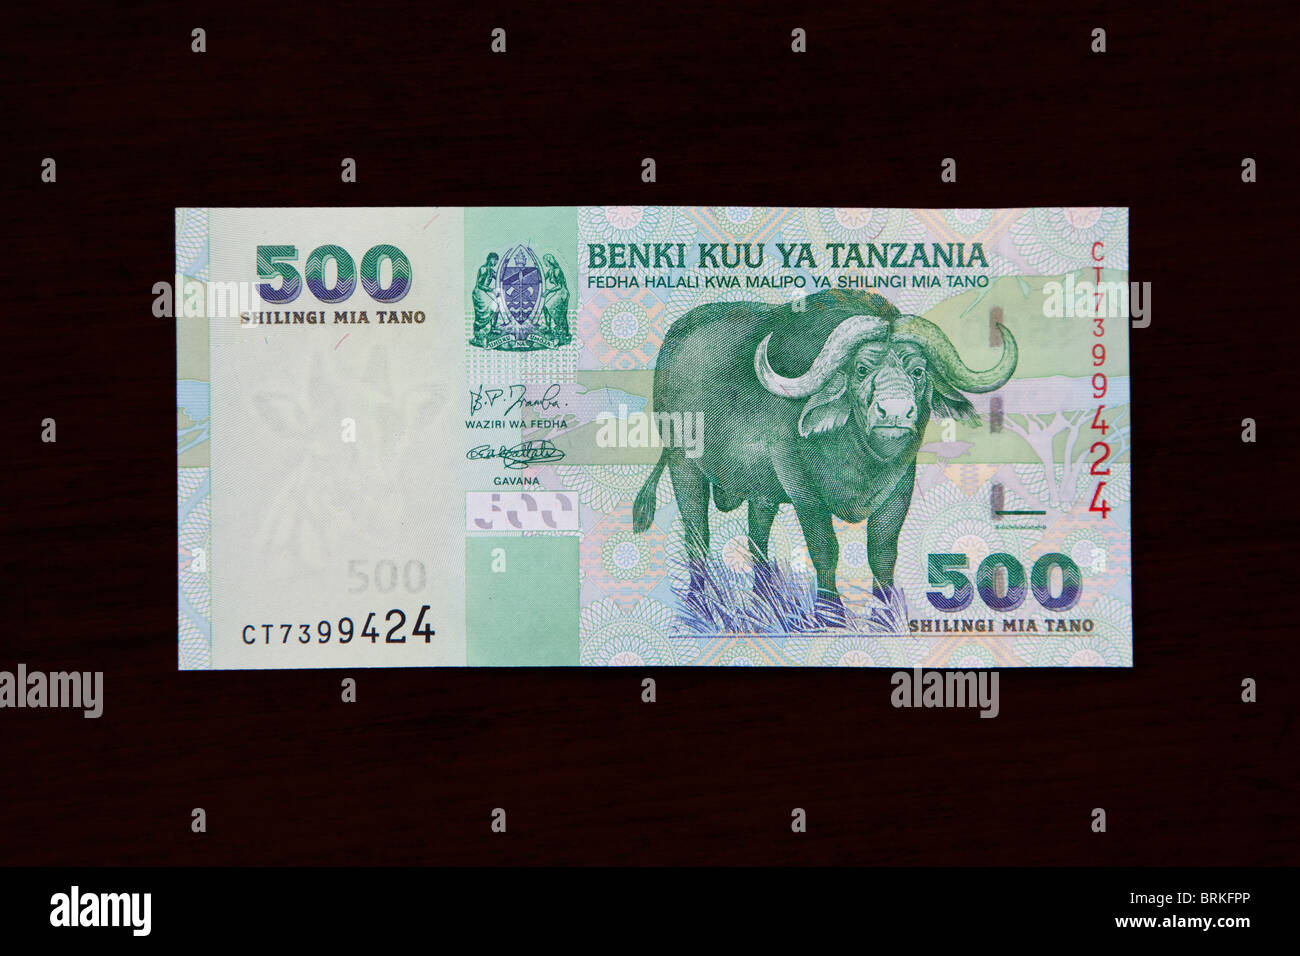 Tanzanian Banknote. 500 Shillings, African buffalo on front. - Stock Image